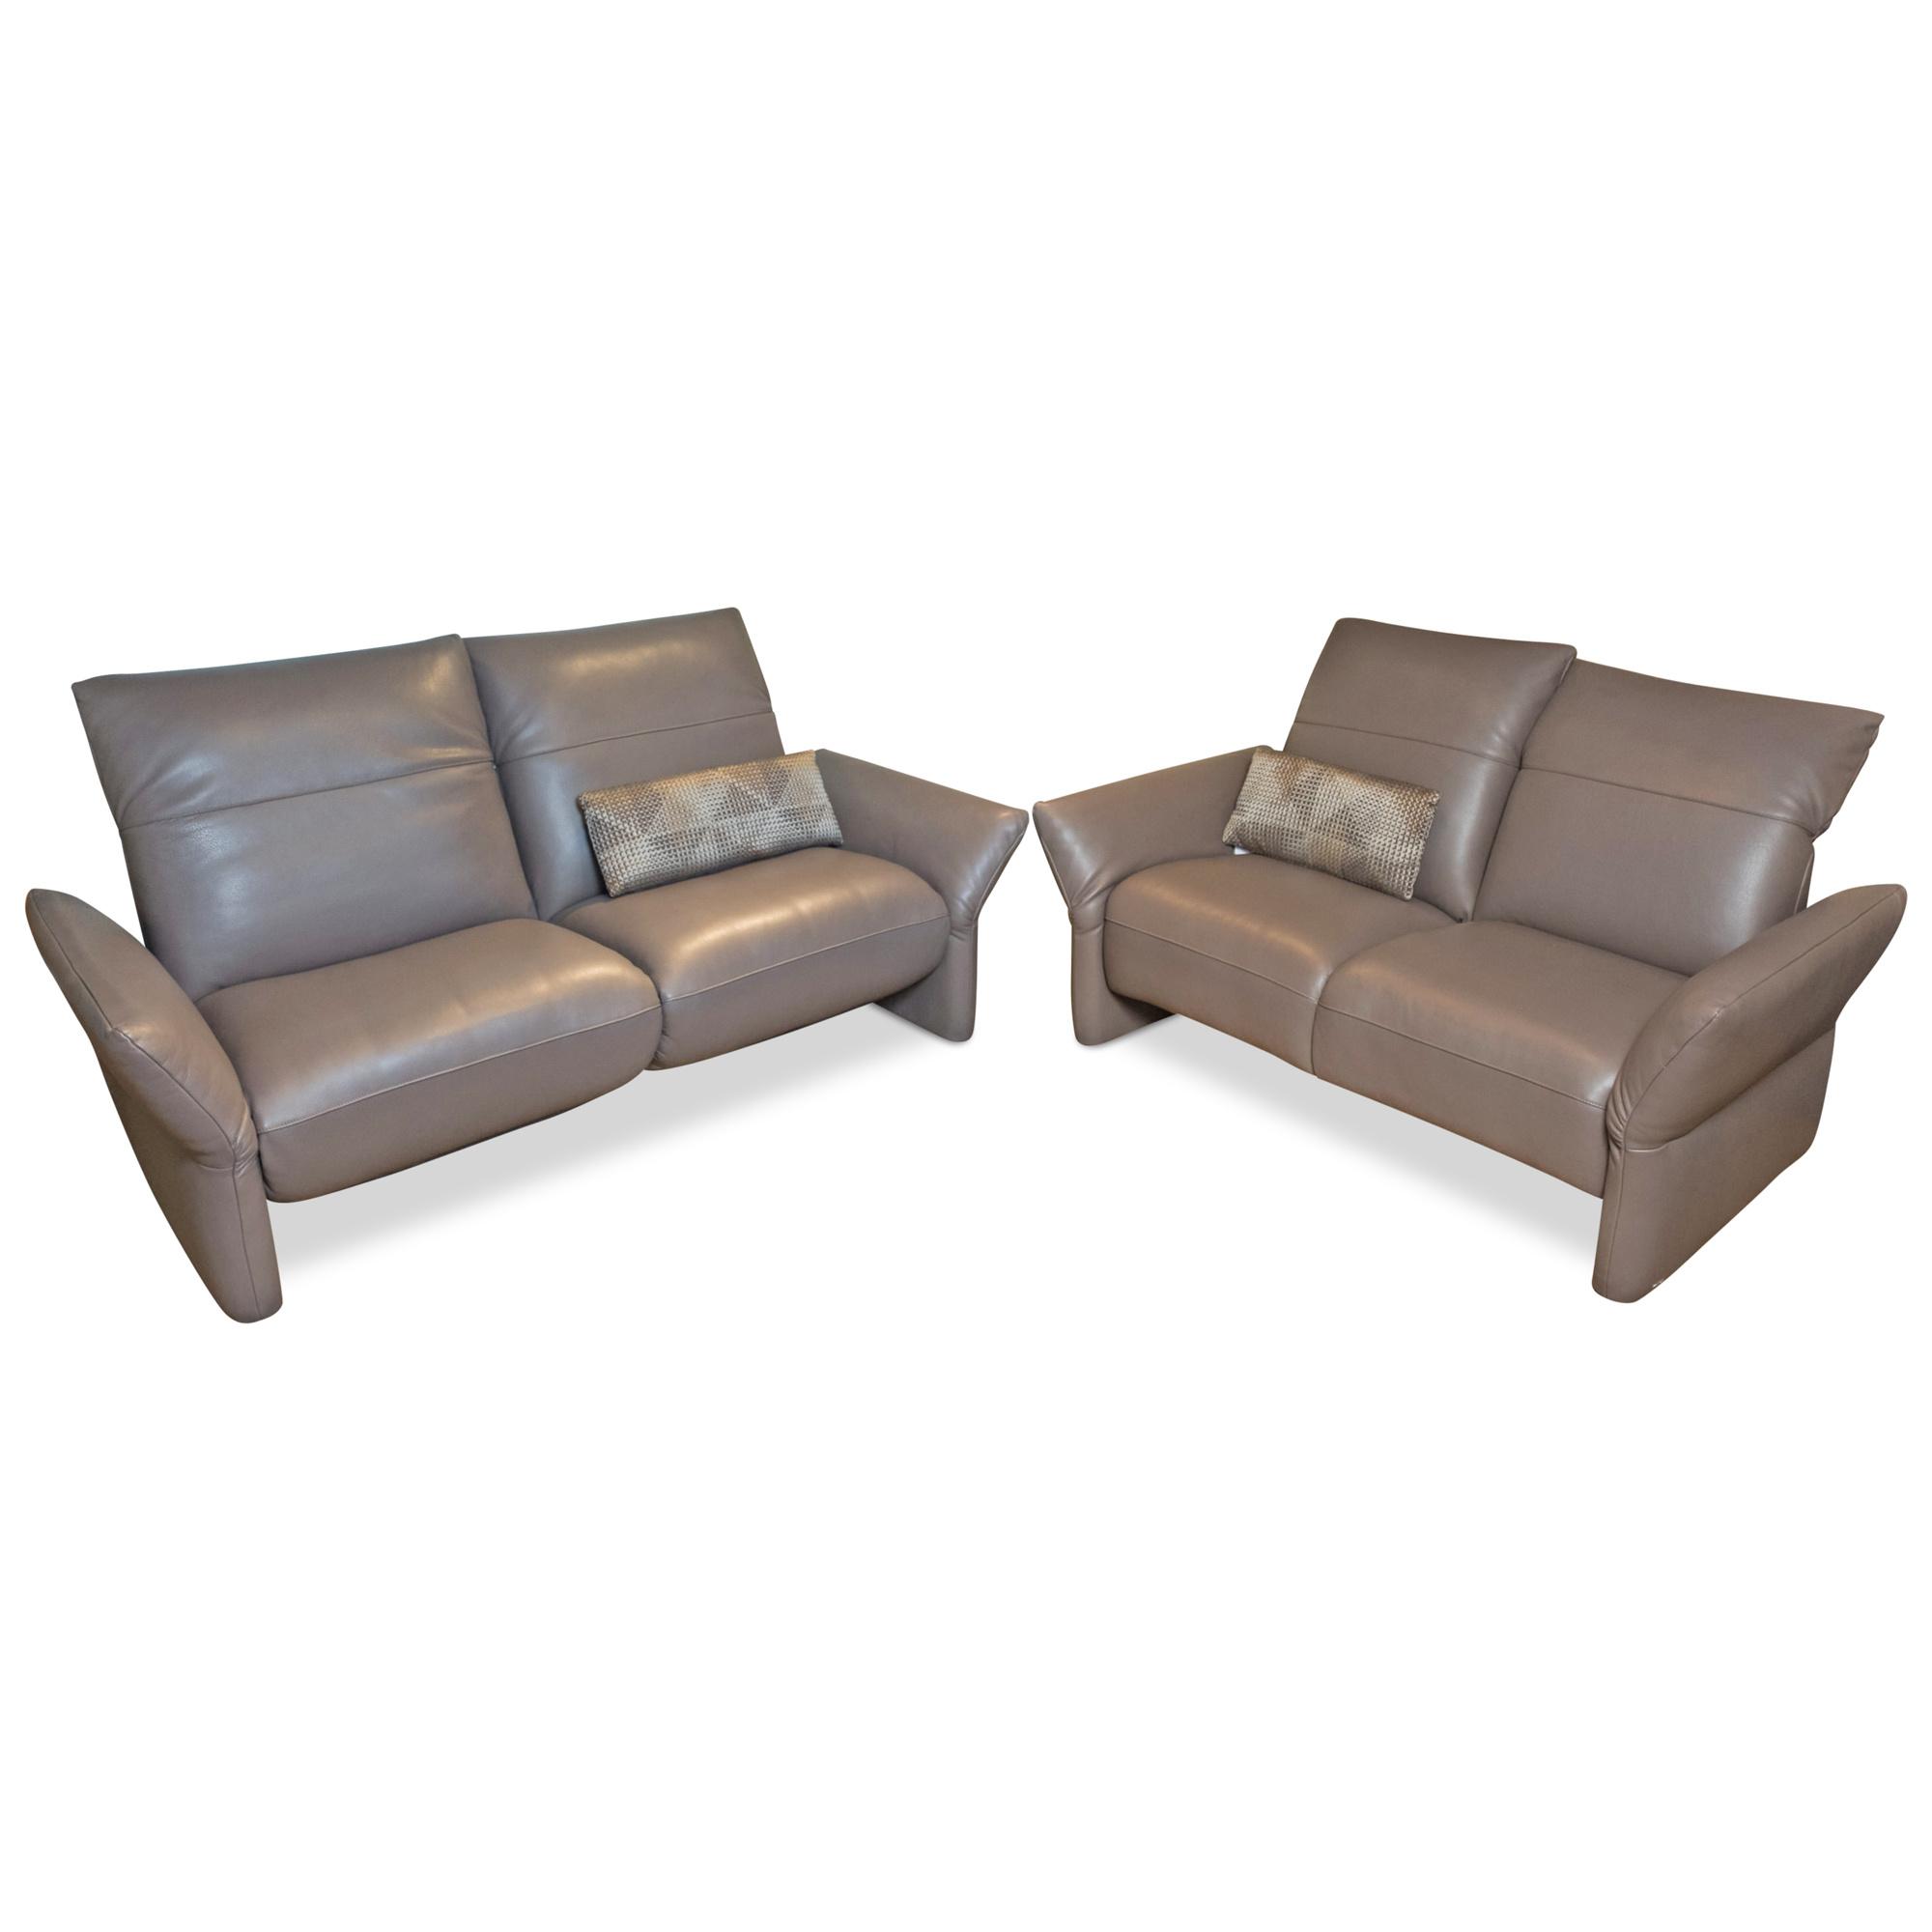 Innenarchitektur Koinor Händler Beste Wahl • Sofa • Leder • Metall •